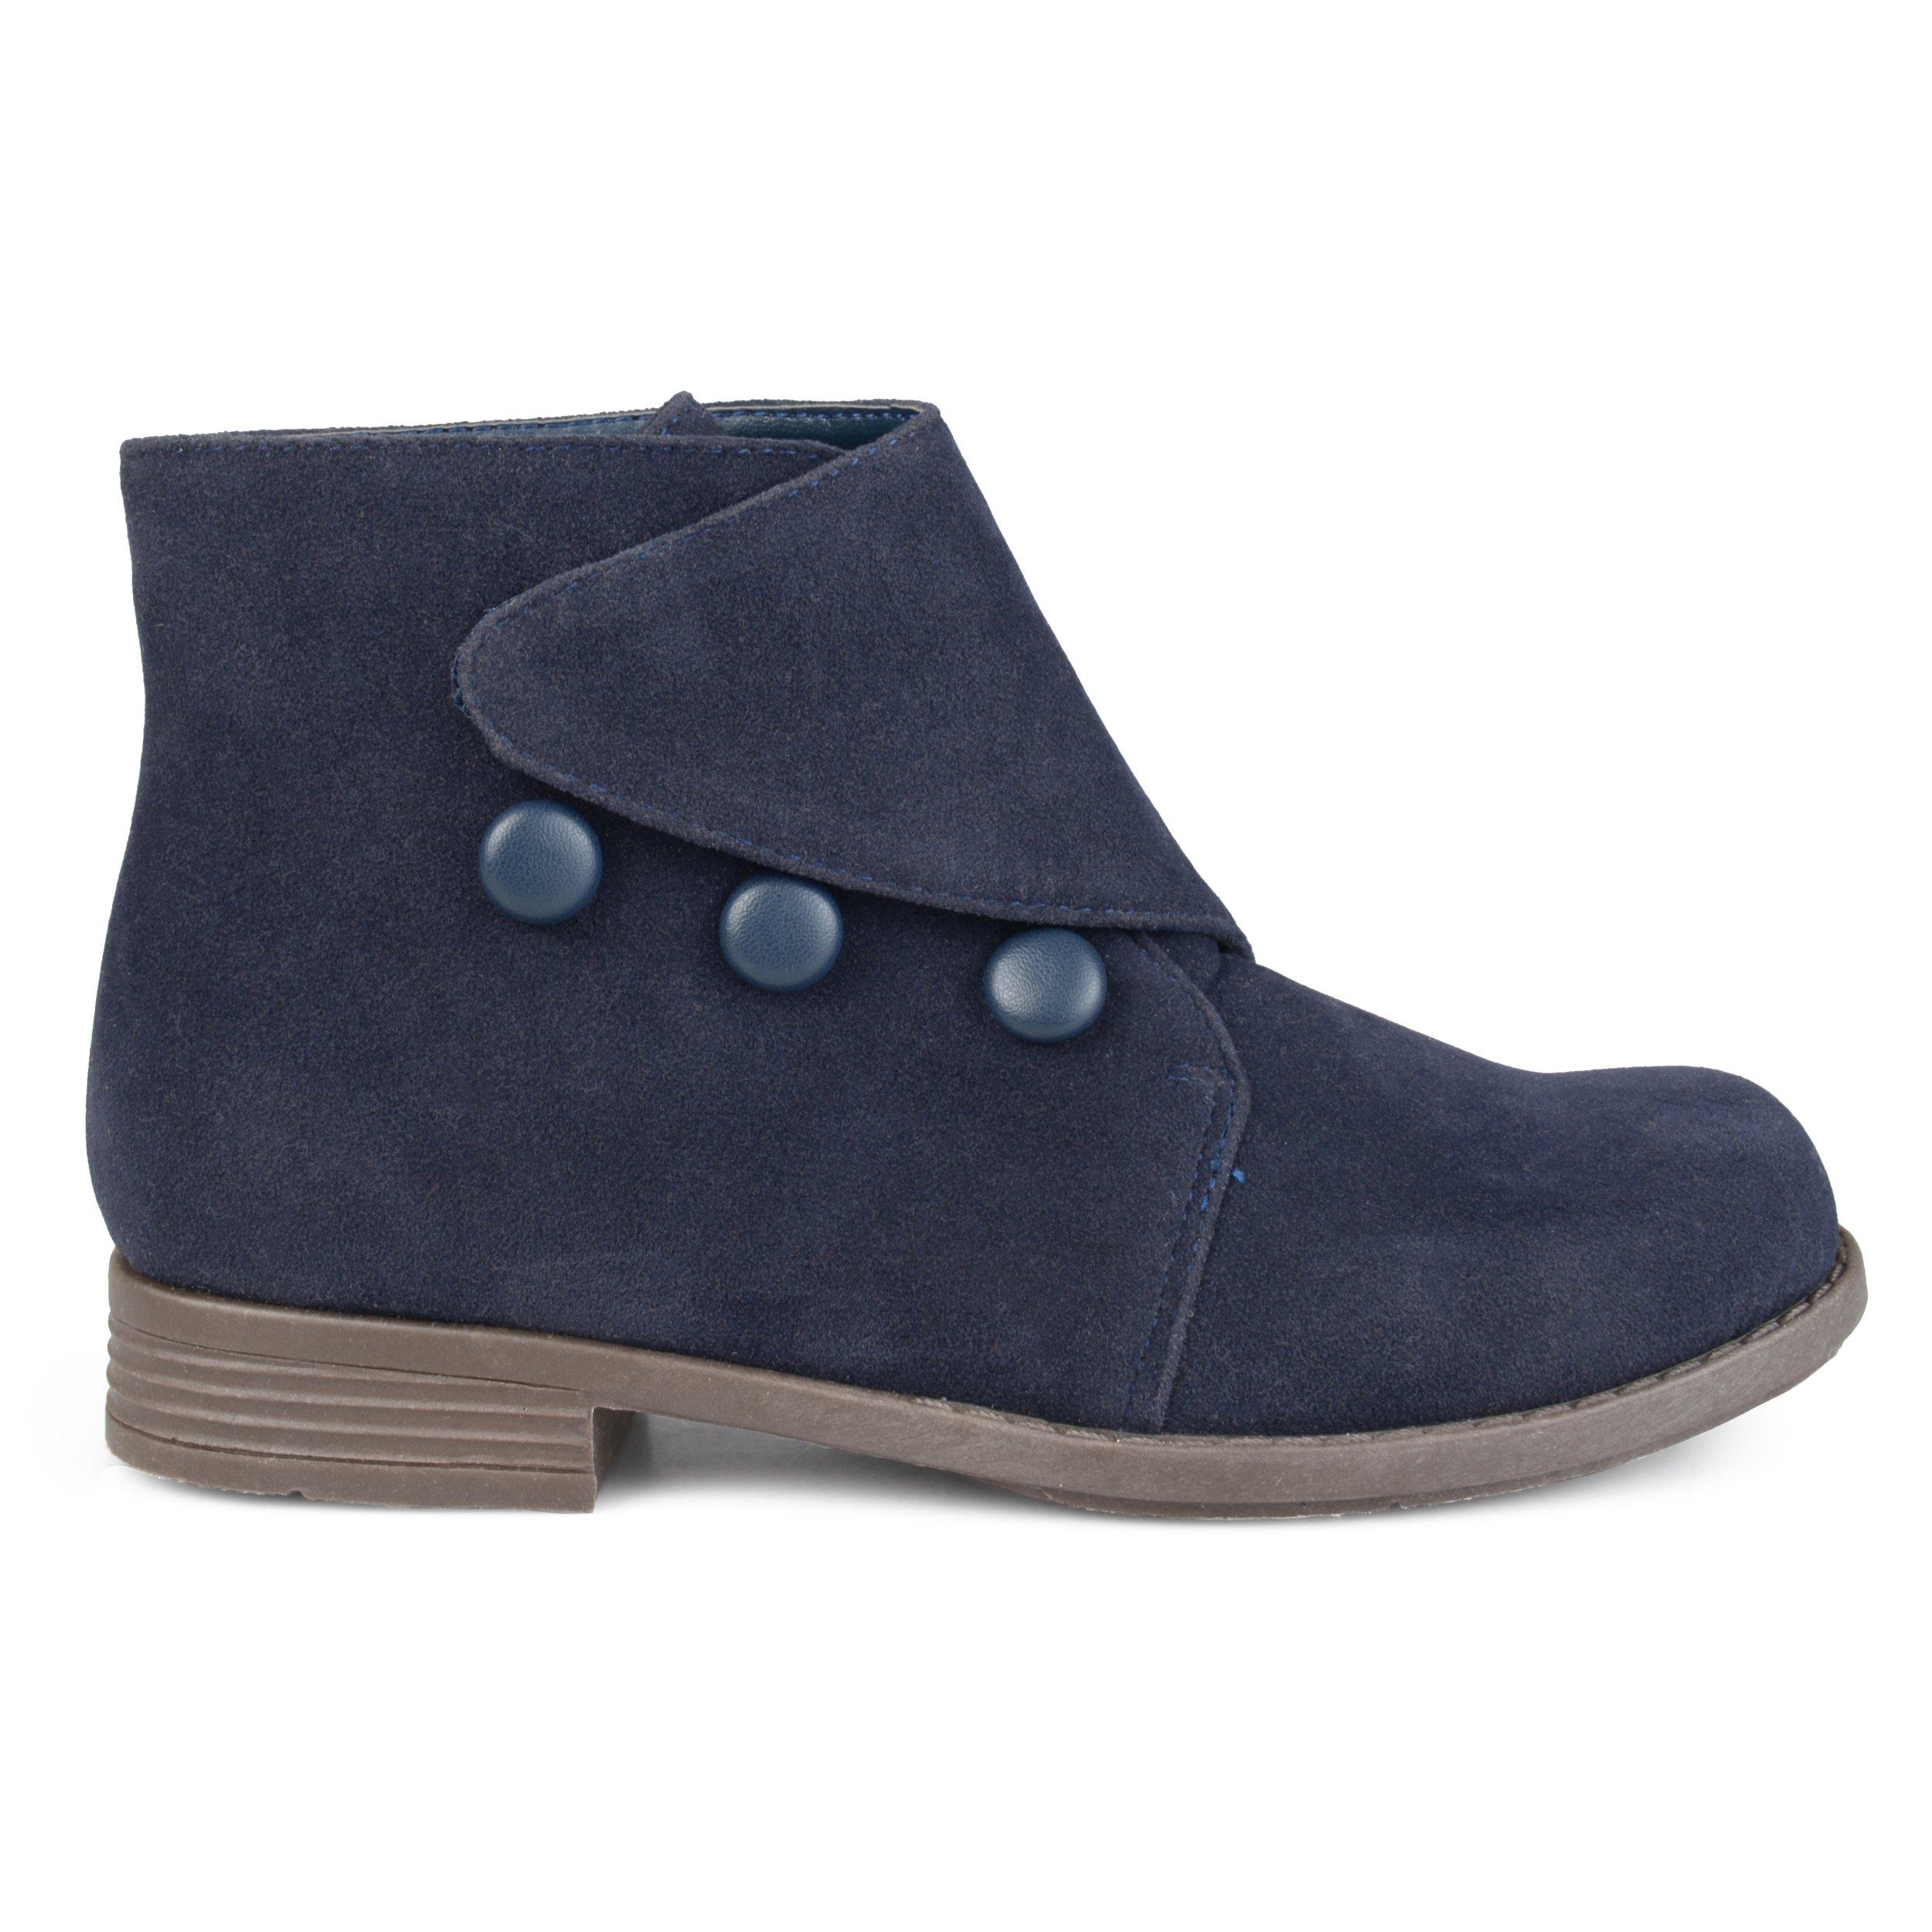 Brinley Co. Kids Faux Suede Button Vintage Boots Navy, 13 Regular US